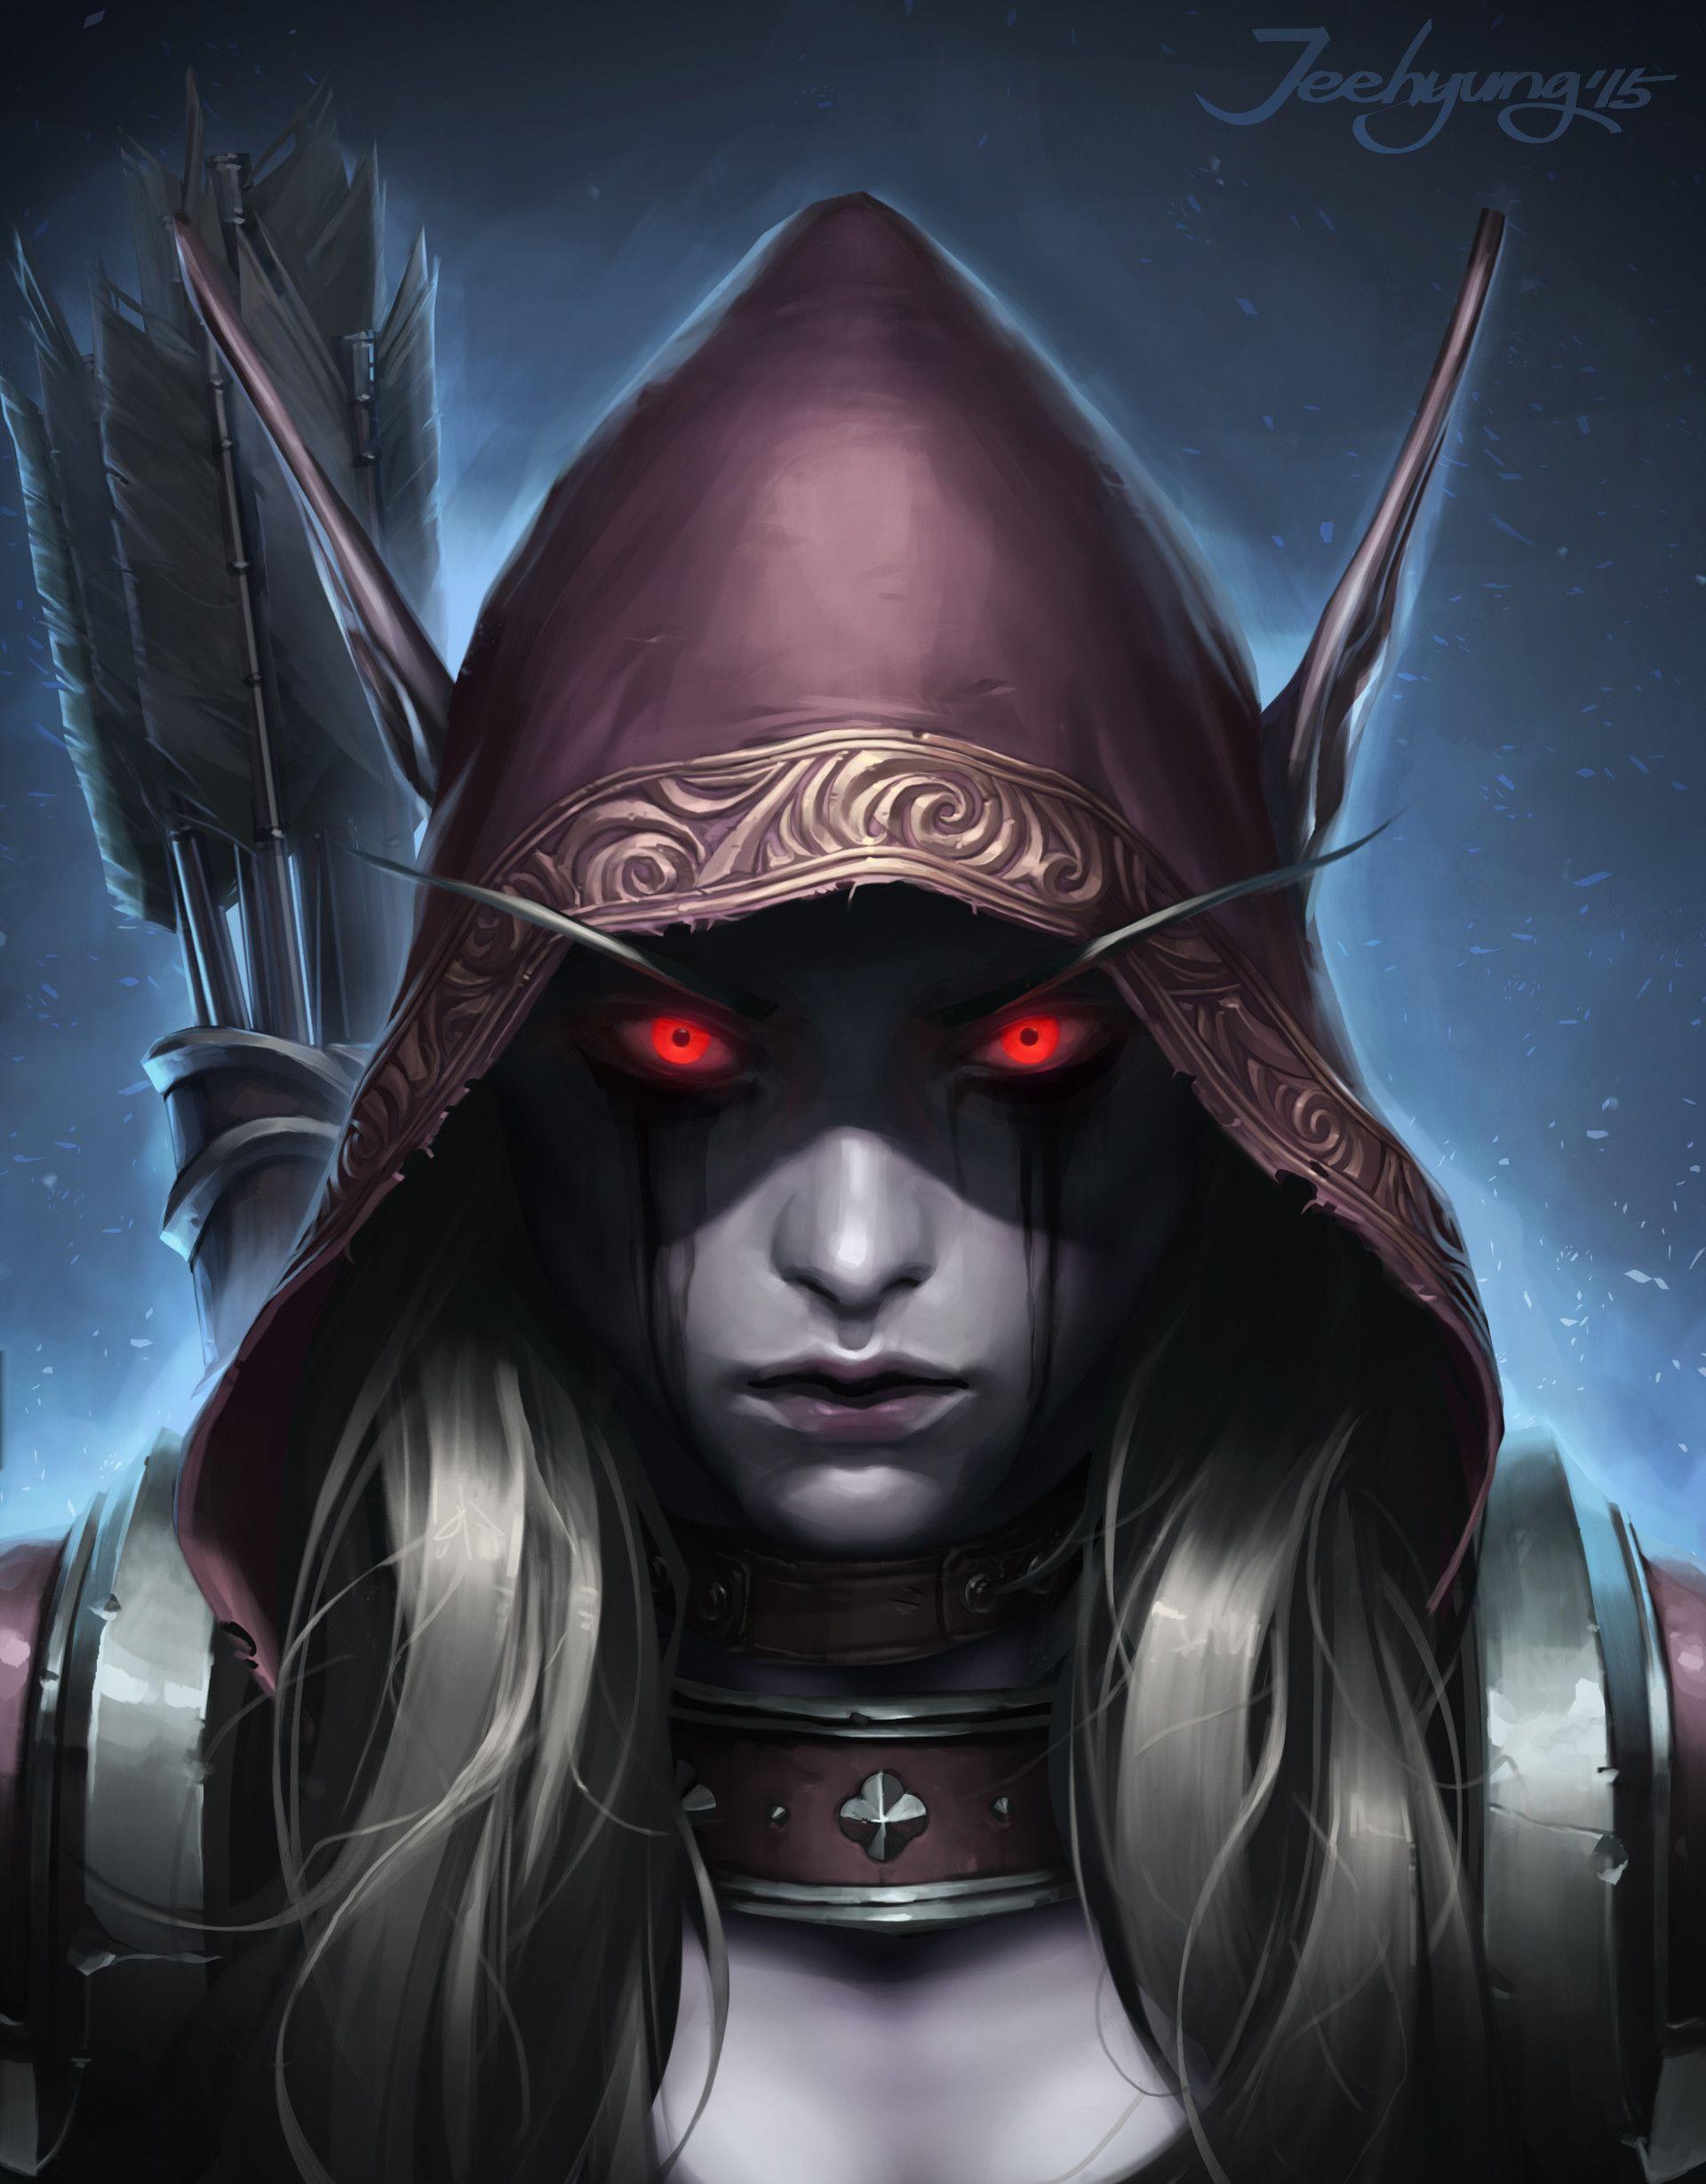 Artstation Jeehyung Jeehyung Lee Sylvanas Windrunner Warcraft Art World Of Warcraft